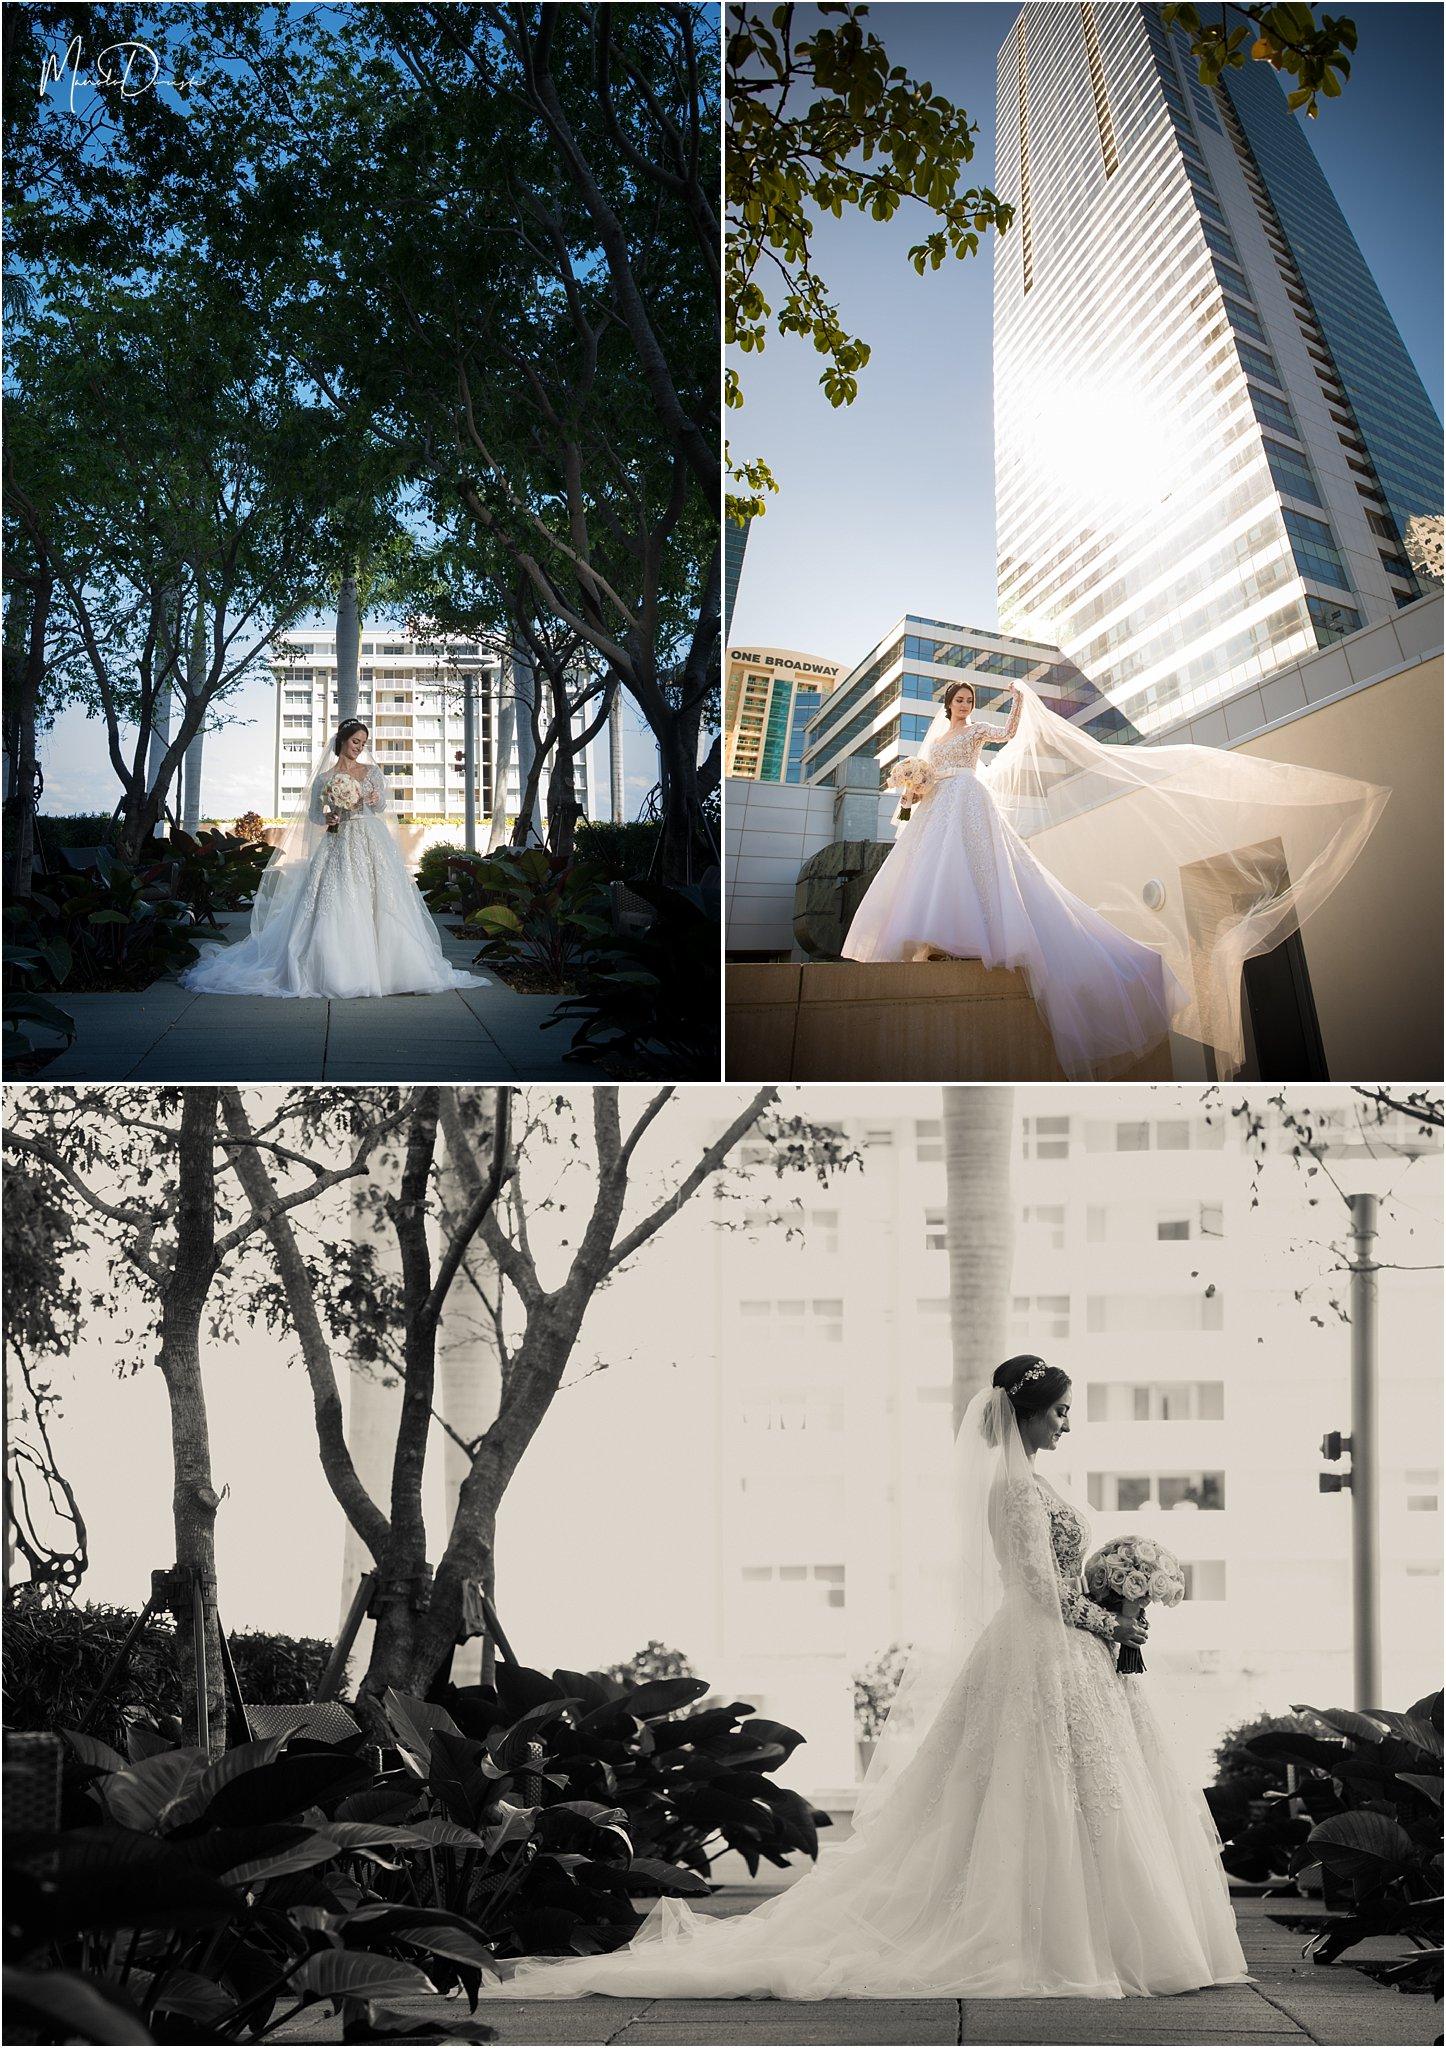 00714_ManoloDoreste_InFocusStudios_Wedding_Family_Photography_Miami_MiamiPhotographer.jpg